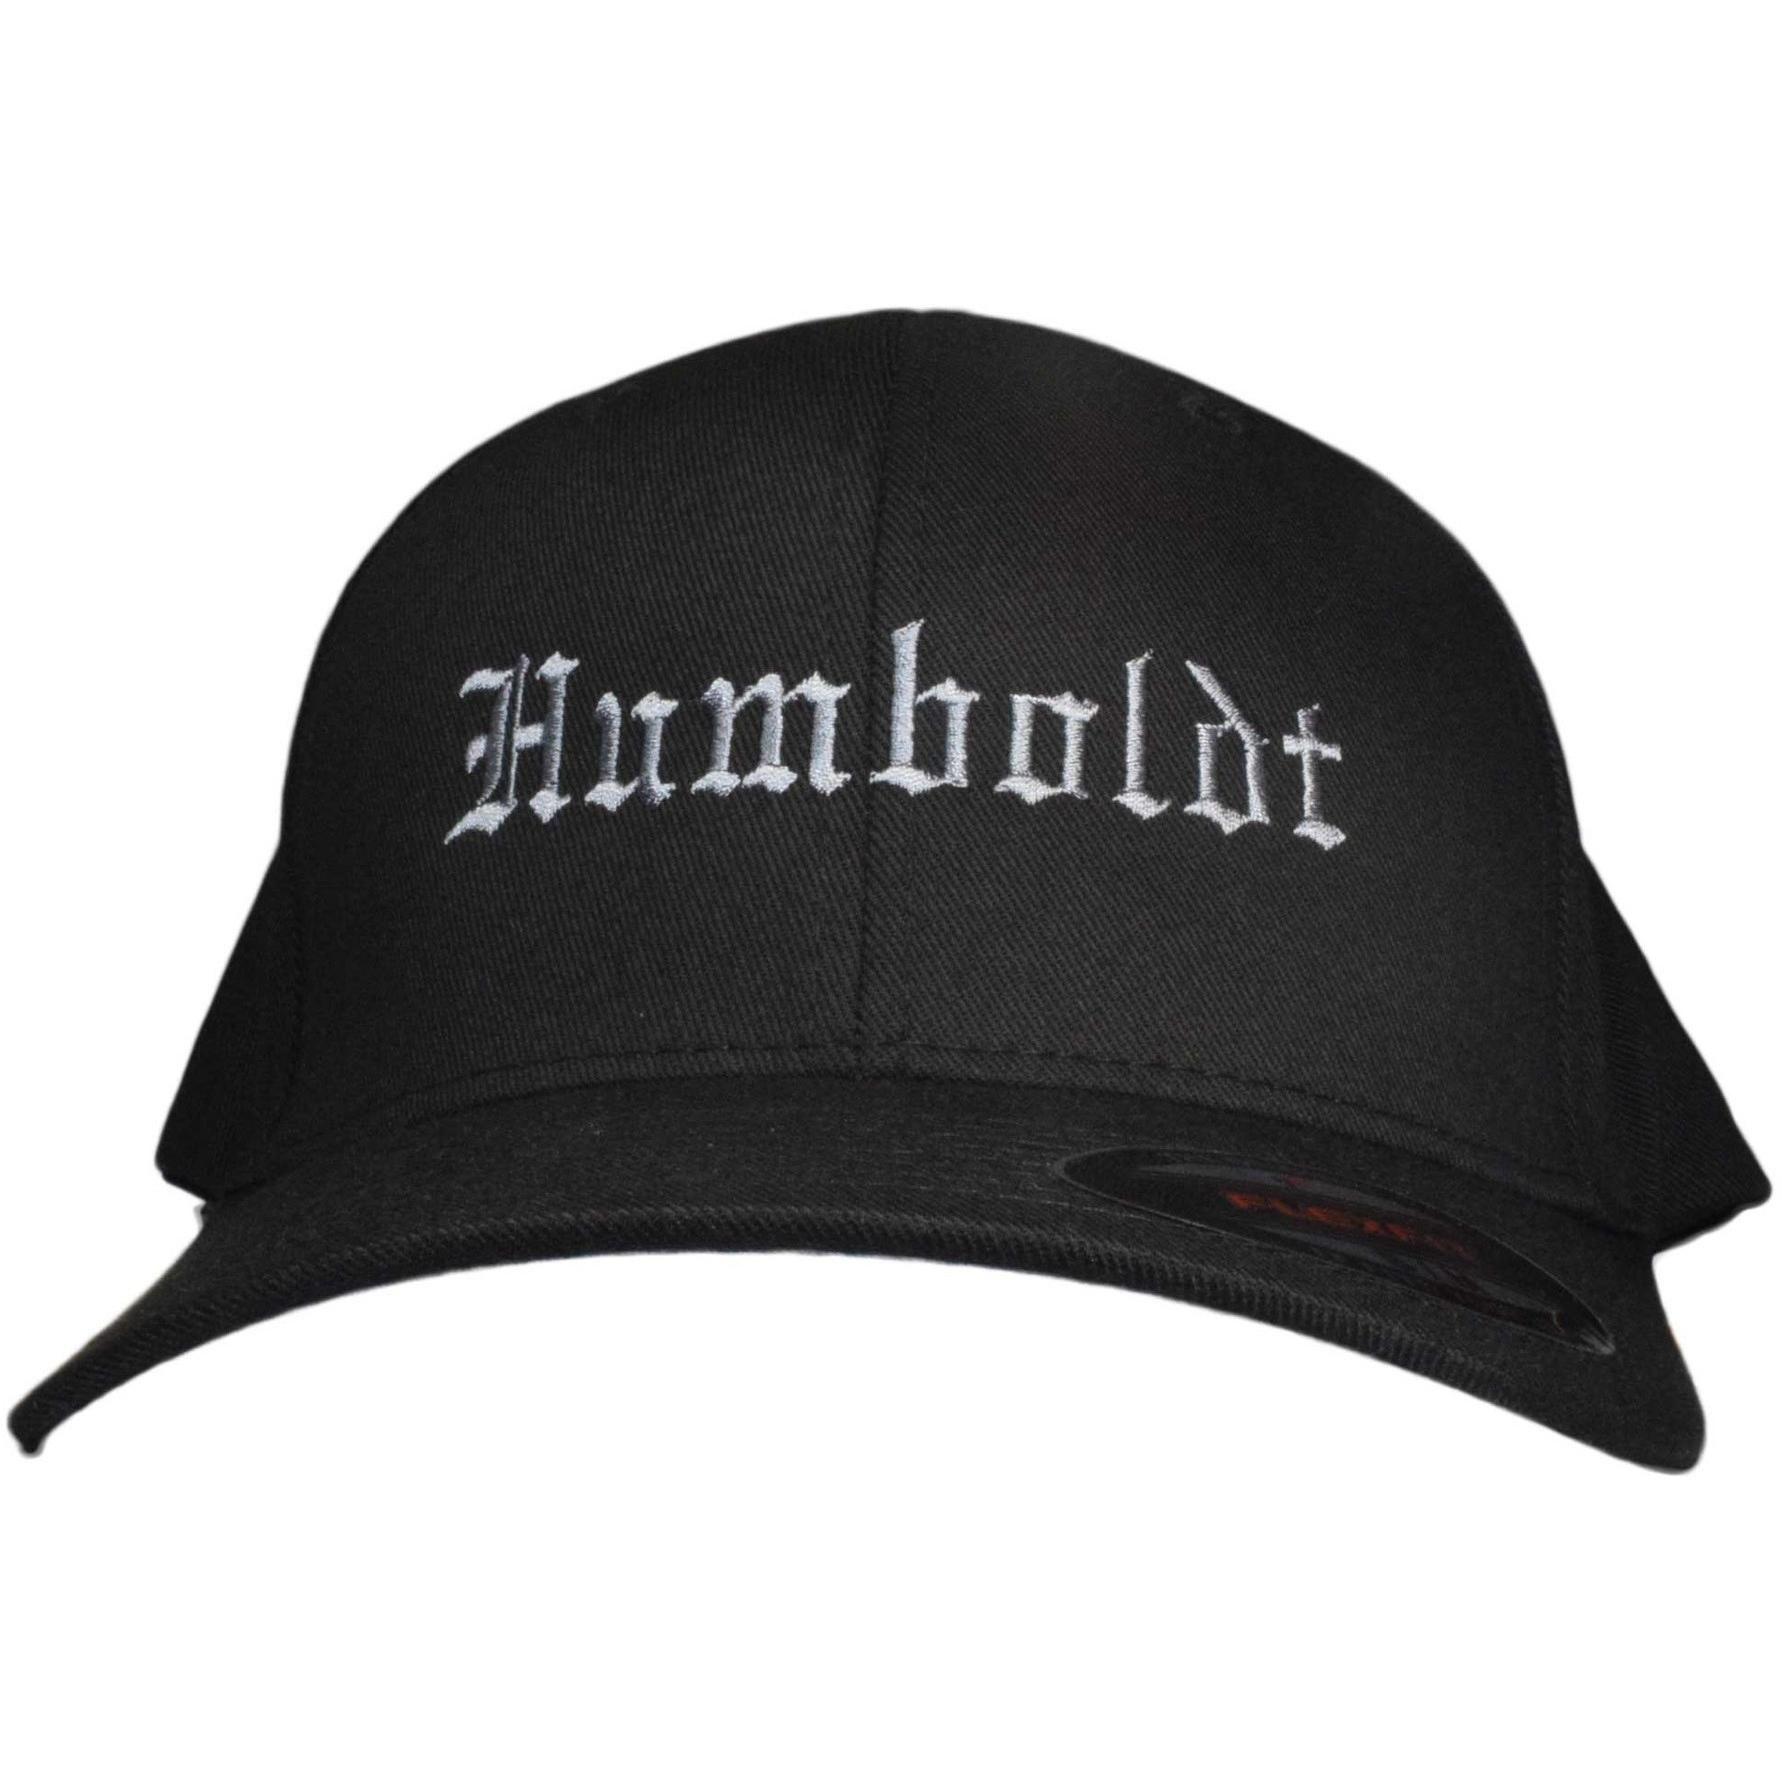 99e6c445a22 Curved Bill Old English Flex Hat